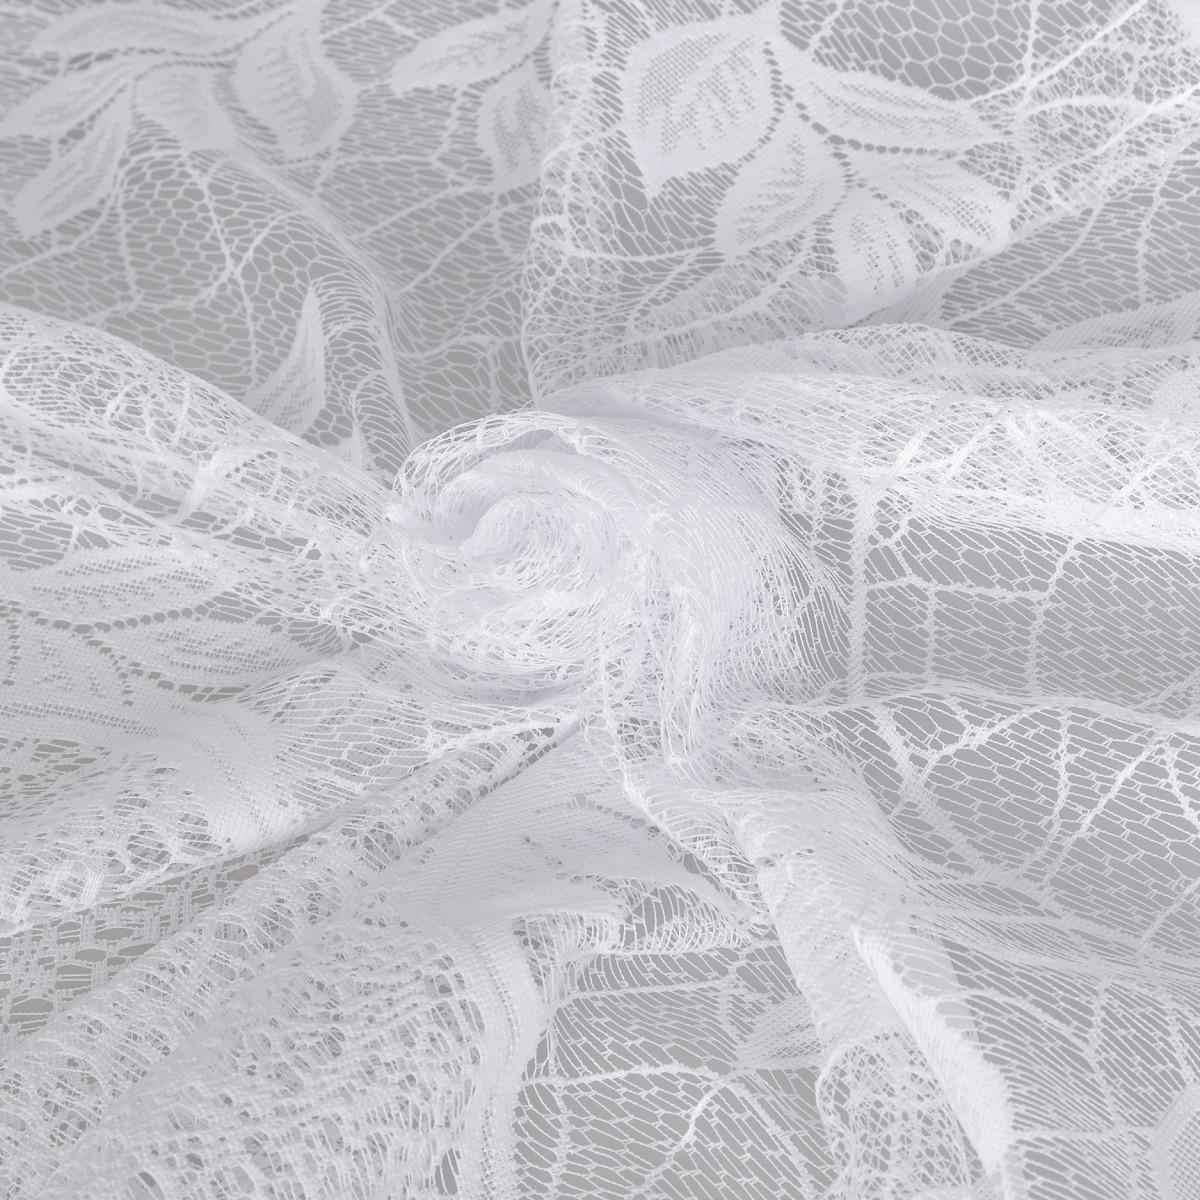 Тюль 1 м/п Арка листок сетка 170 см цвет белый